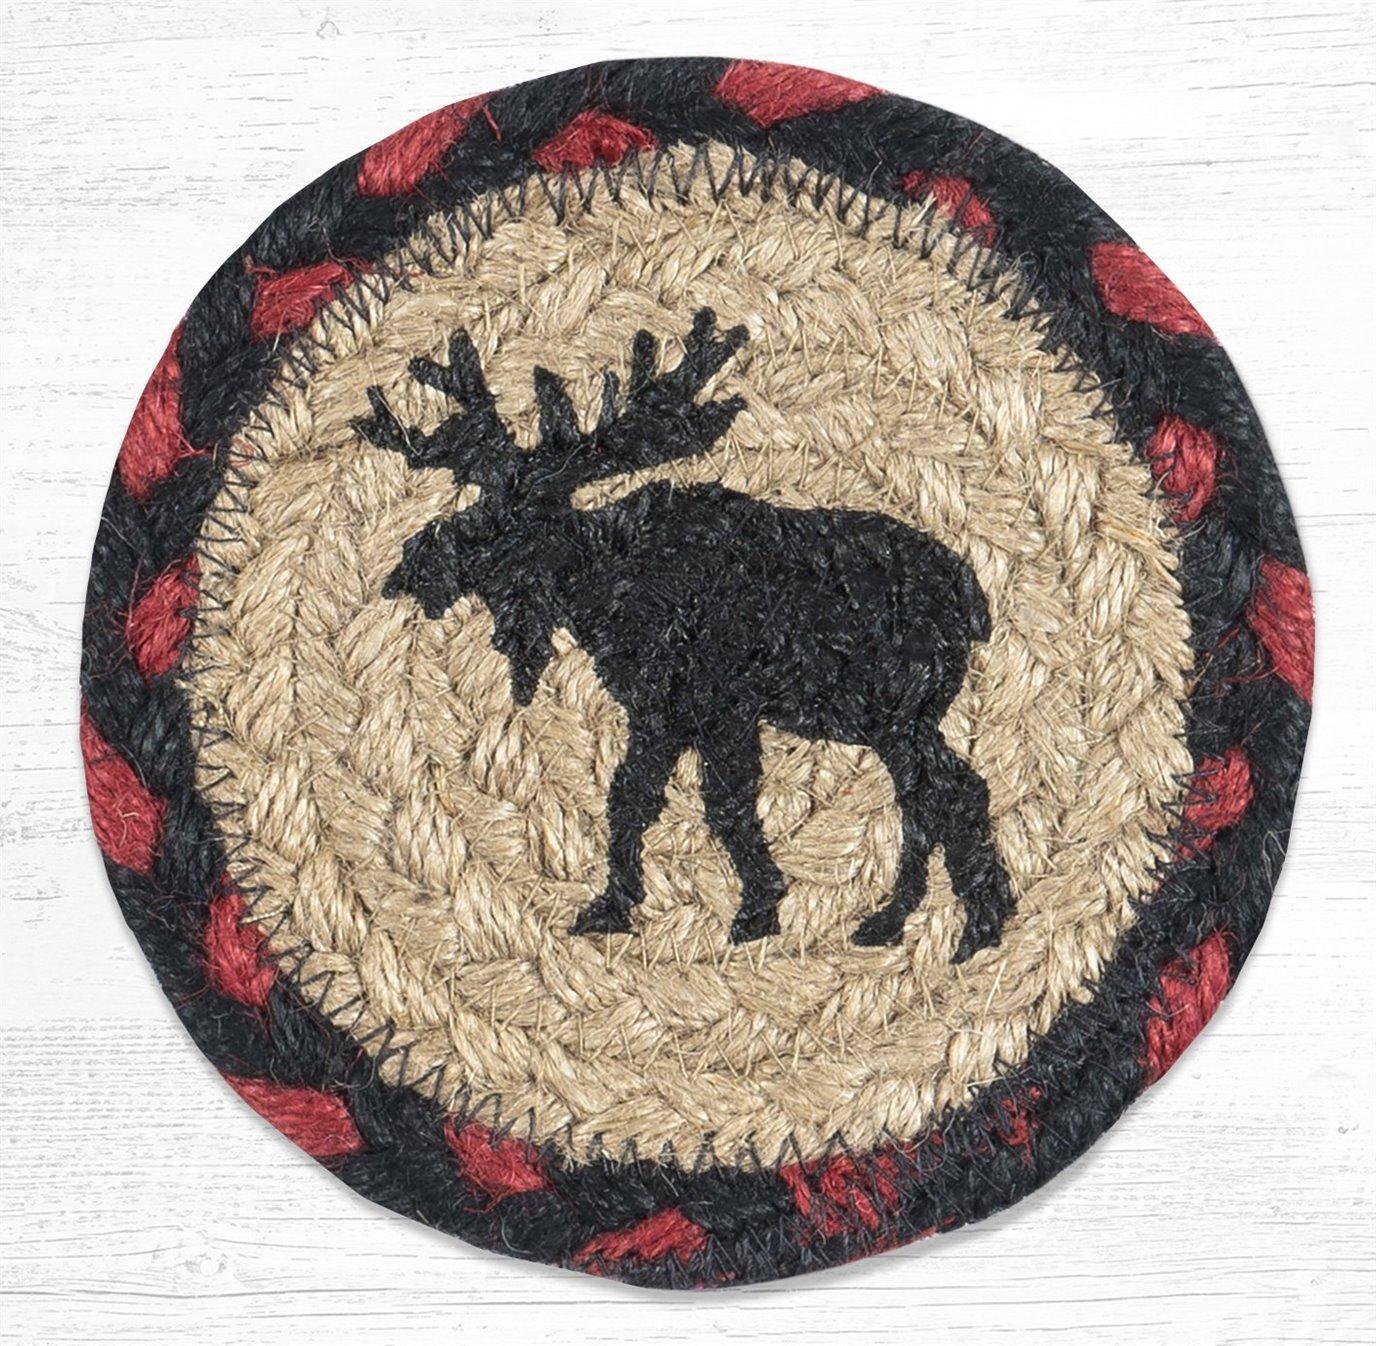 "Black Moose Printed Braided Coaster 5""x5"" Set of 4"